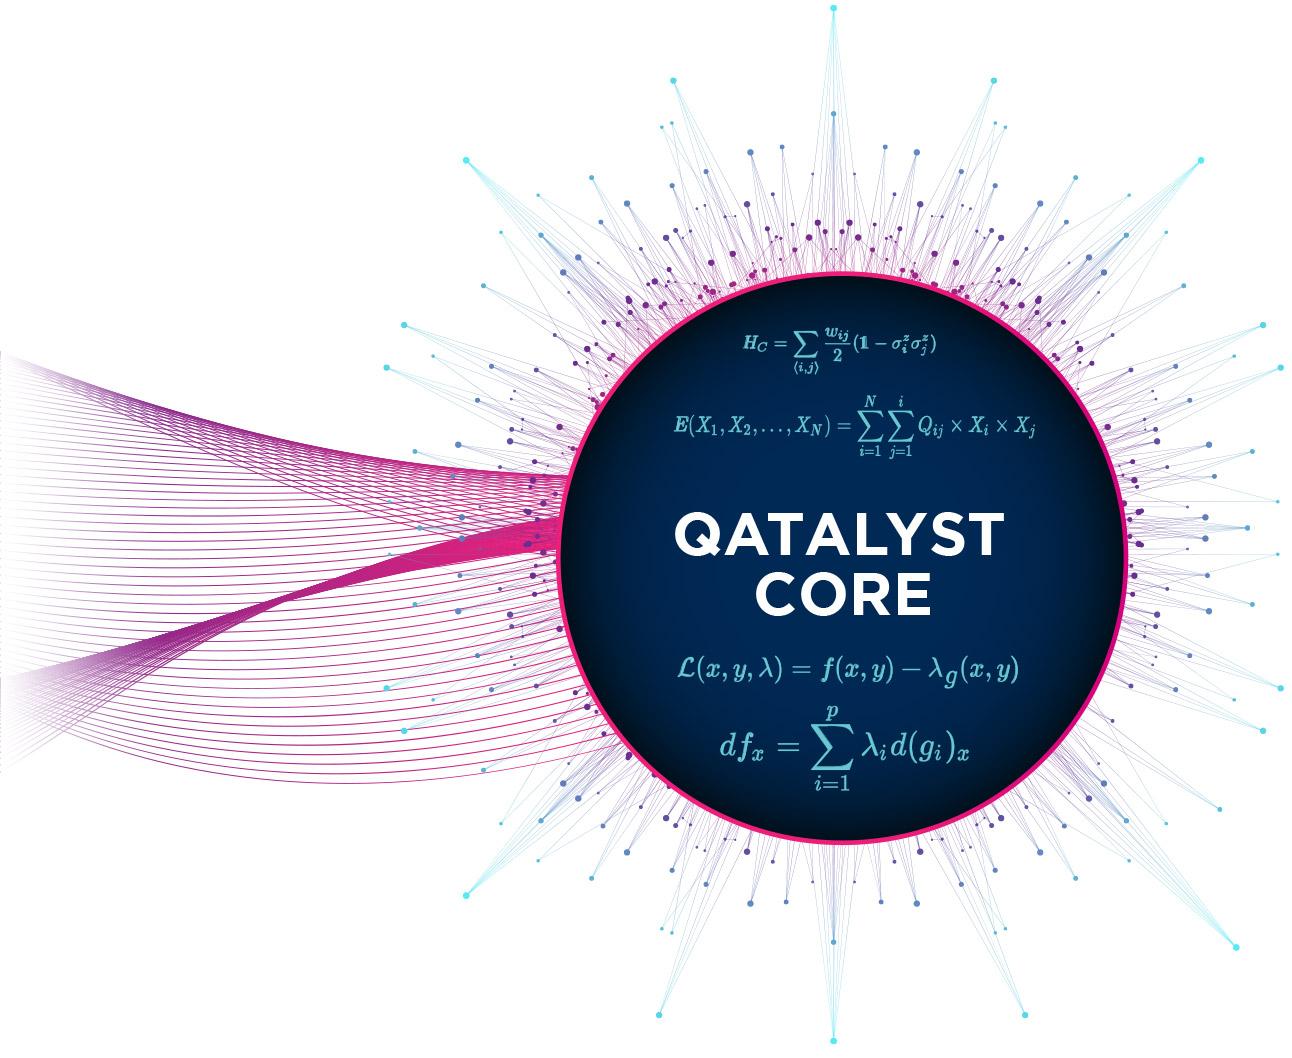 Qatalyst Core graphic